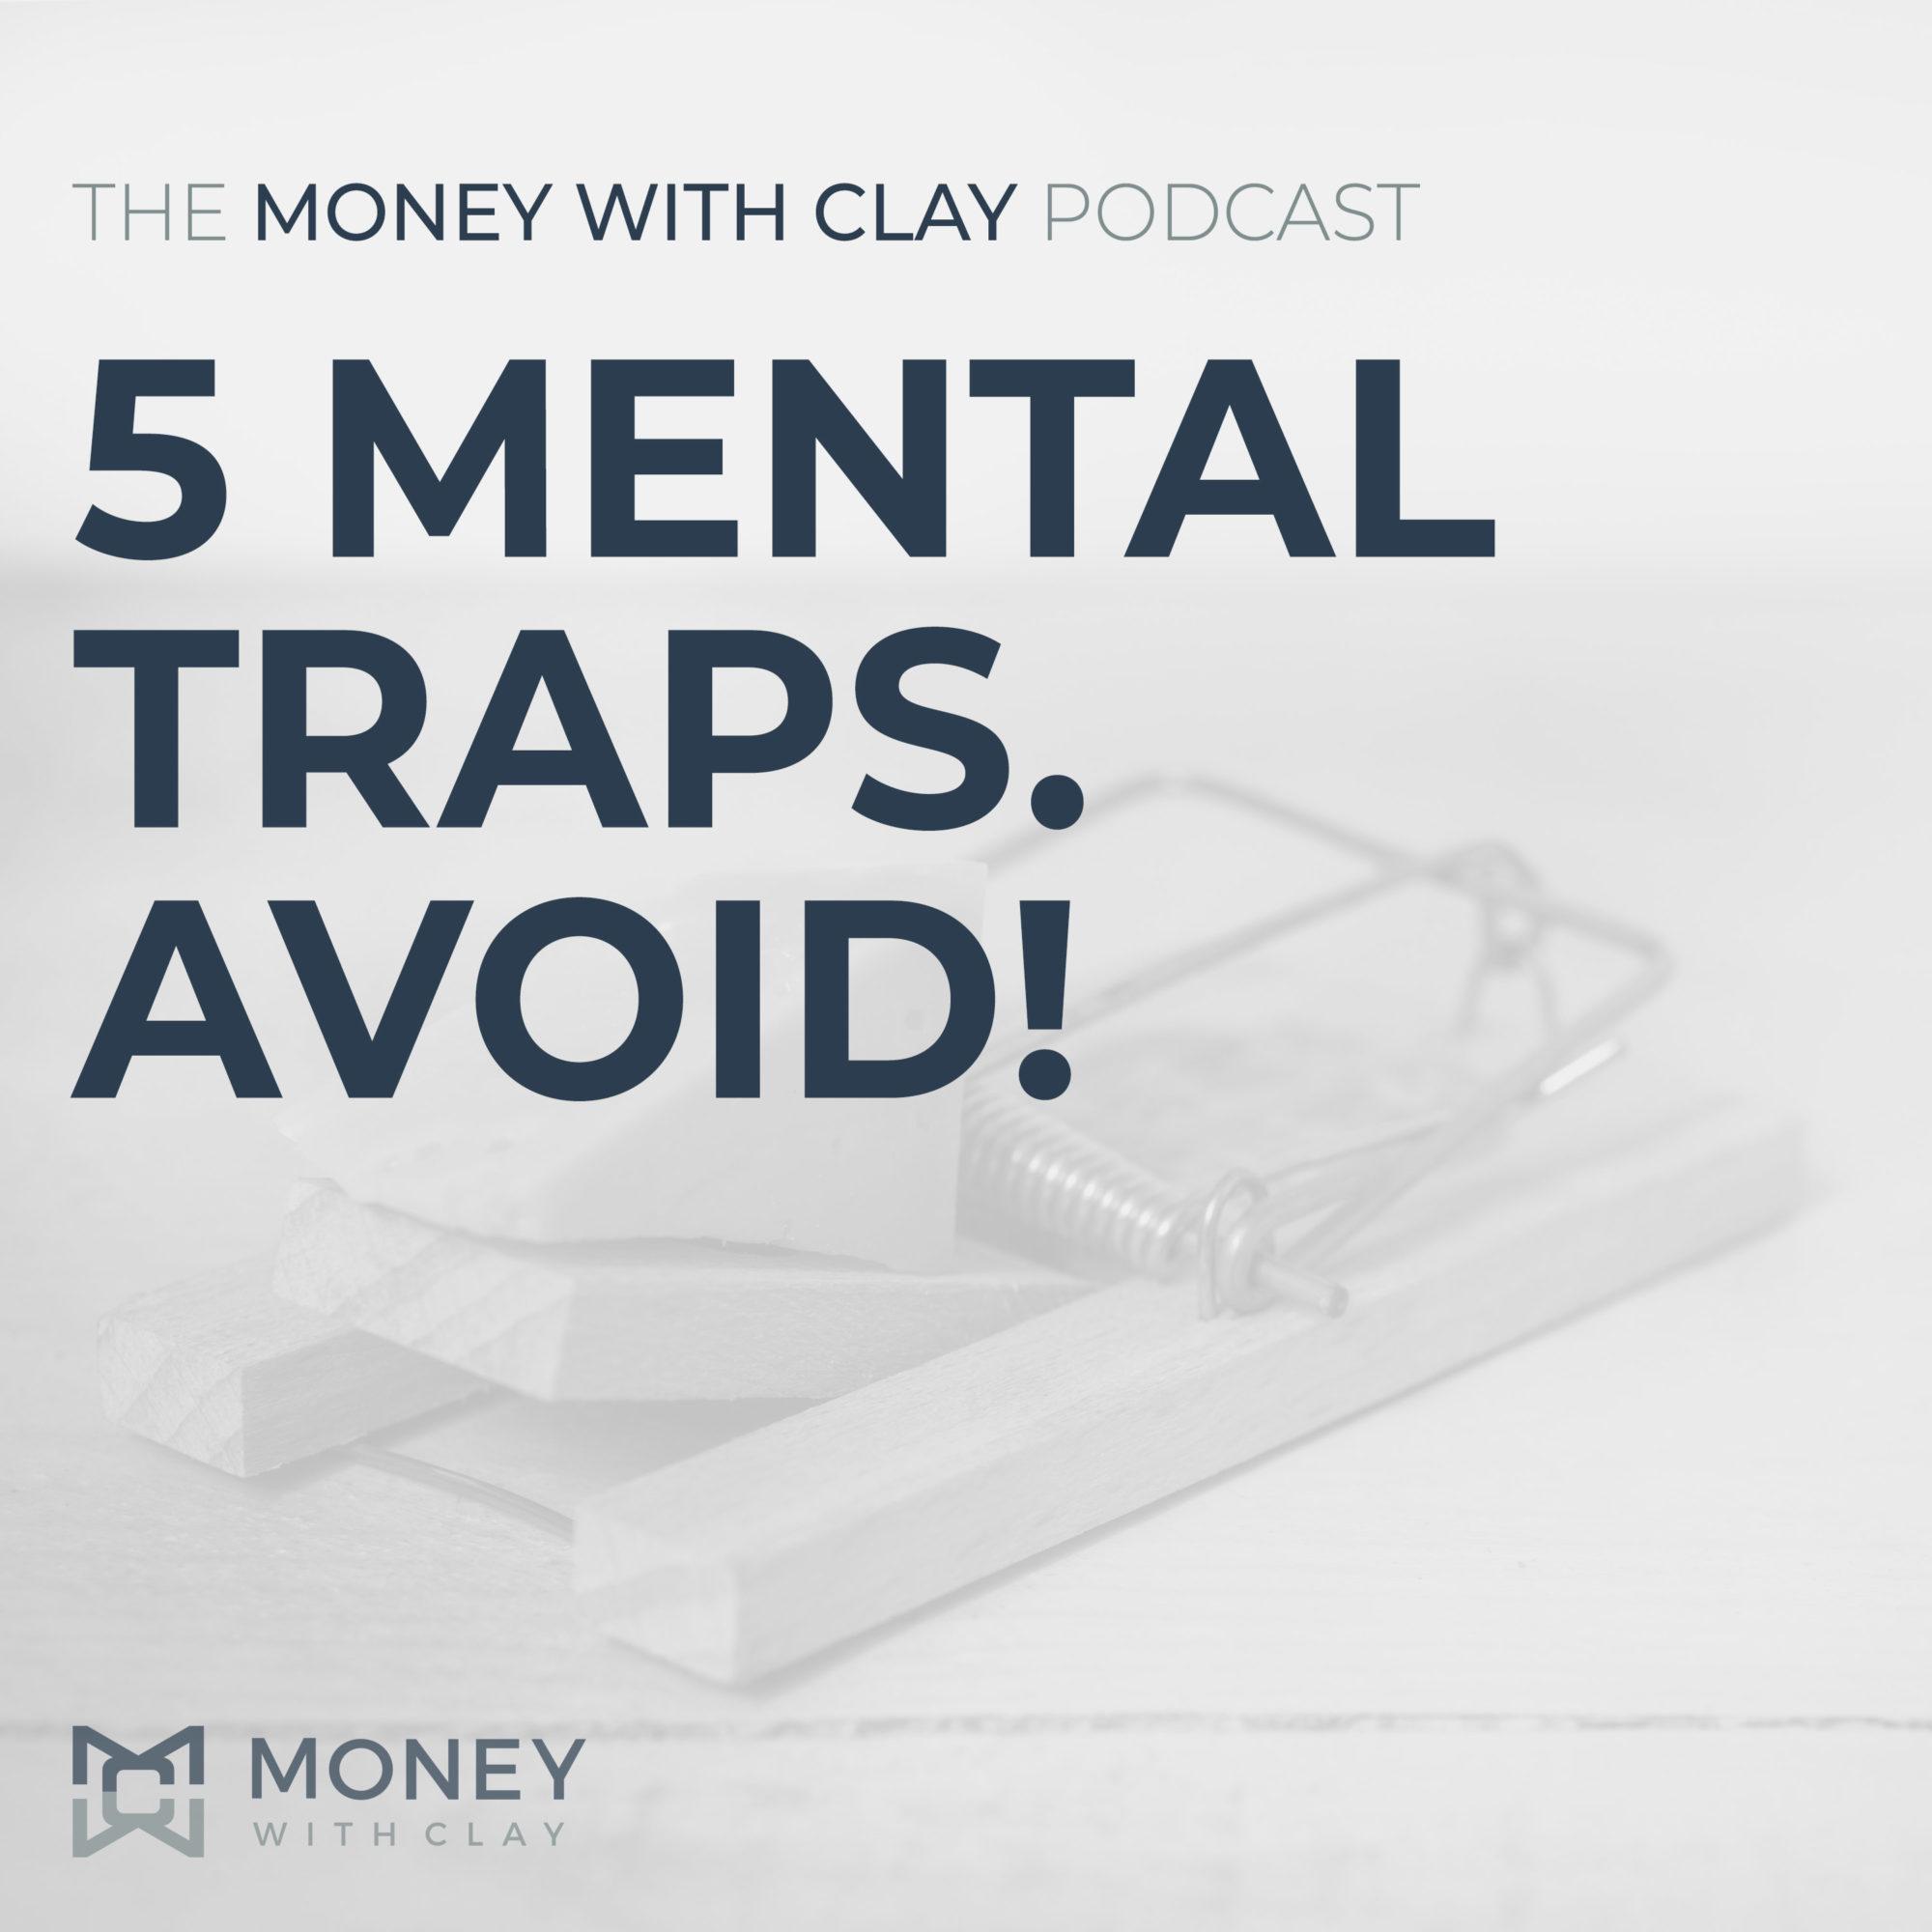 #087 - 5 Mental Traps. Avoid!